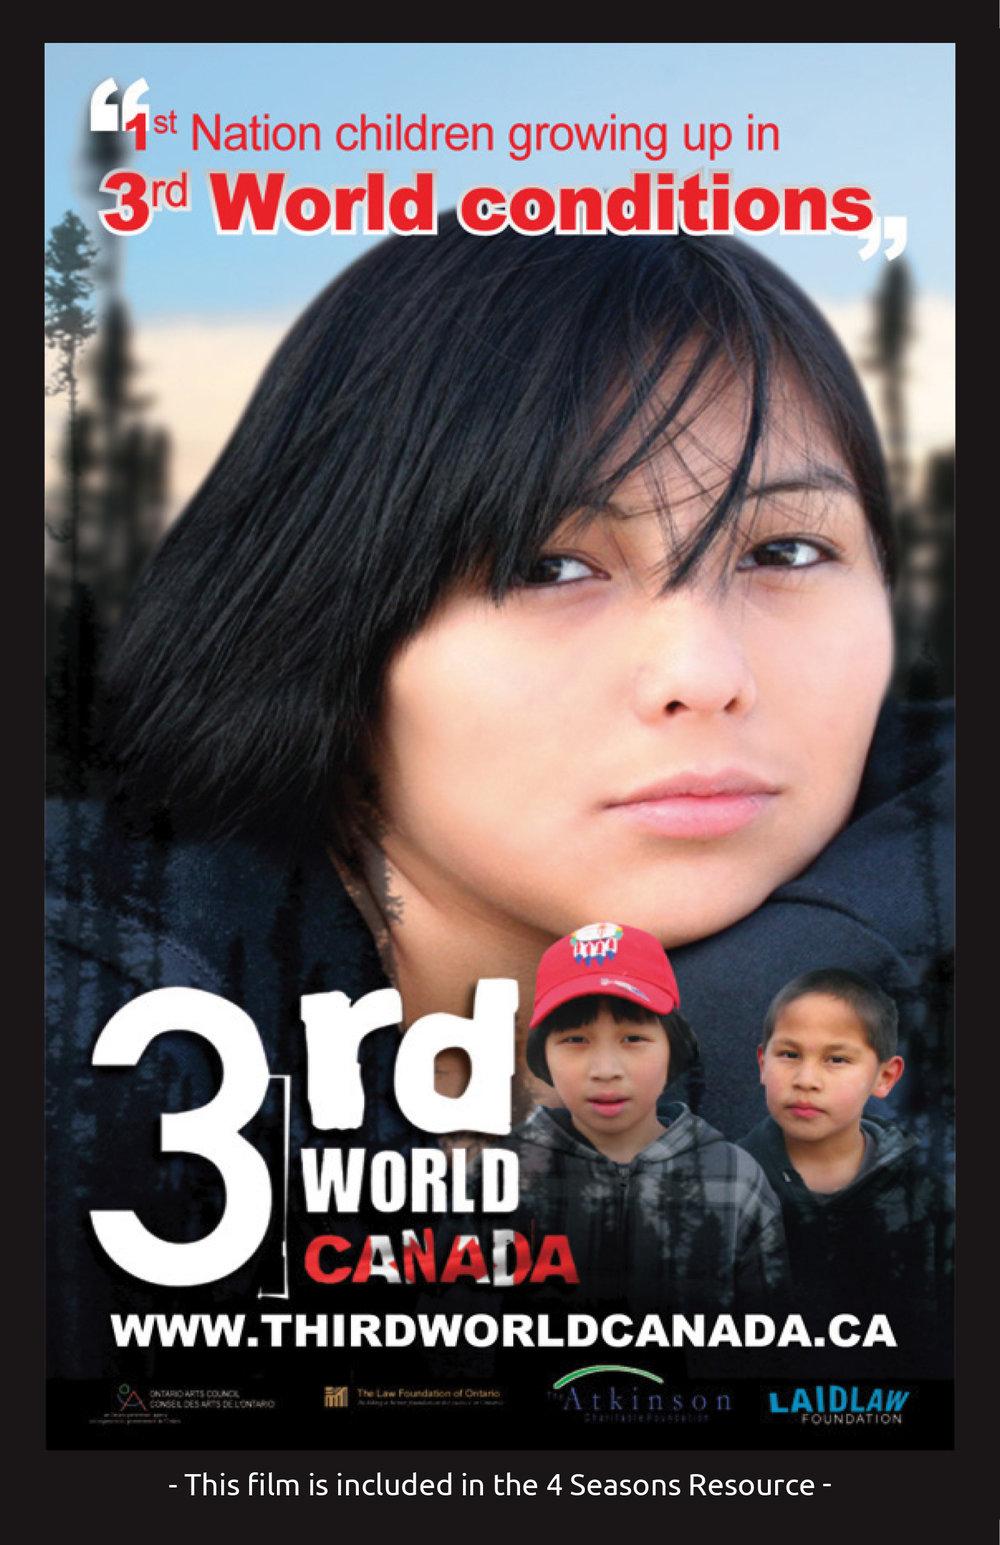 3rd_world_canada_brochure_v2-copy-1.jpg